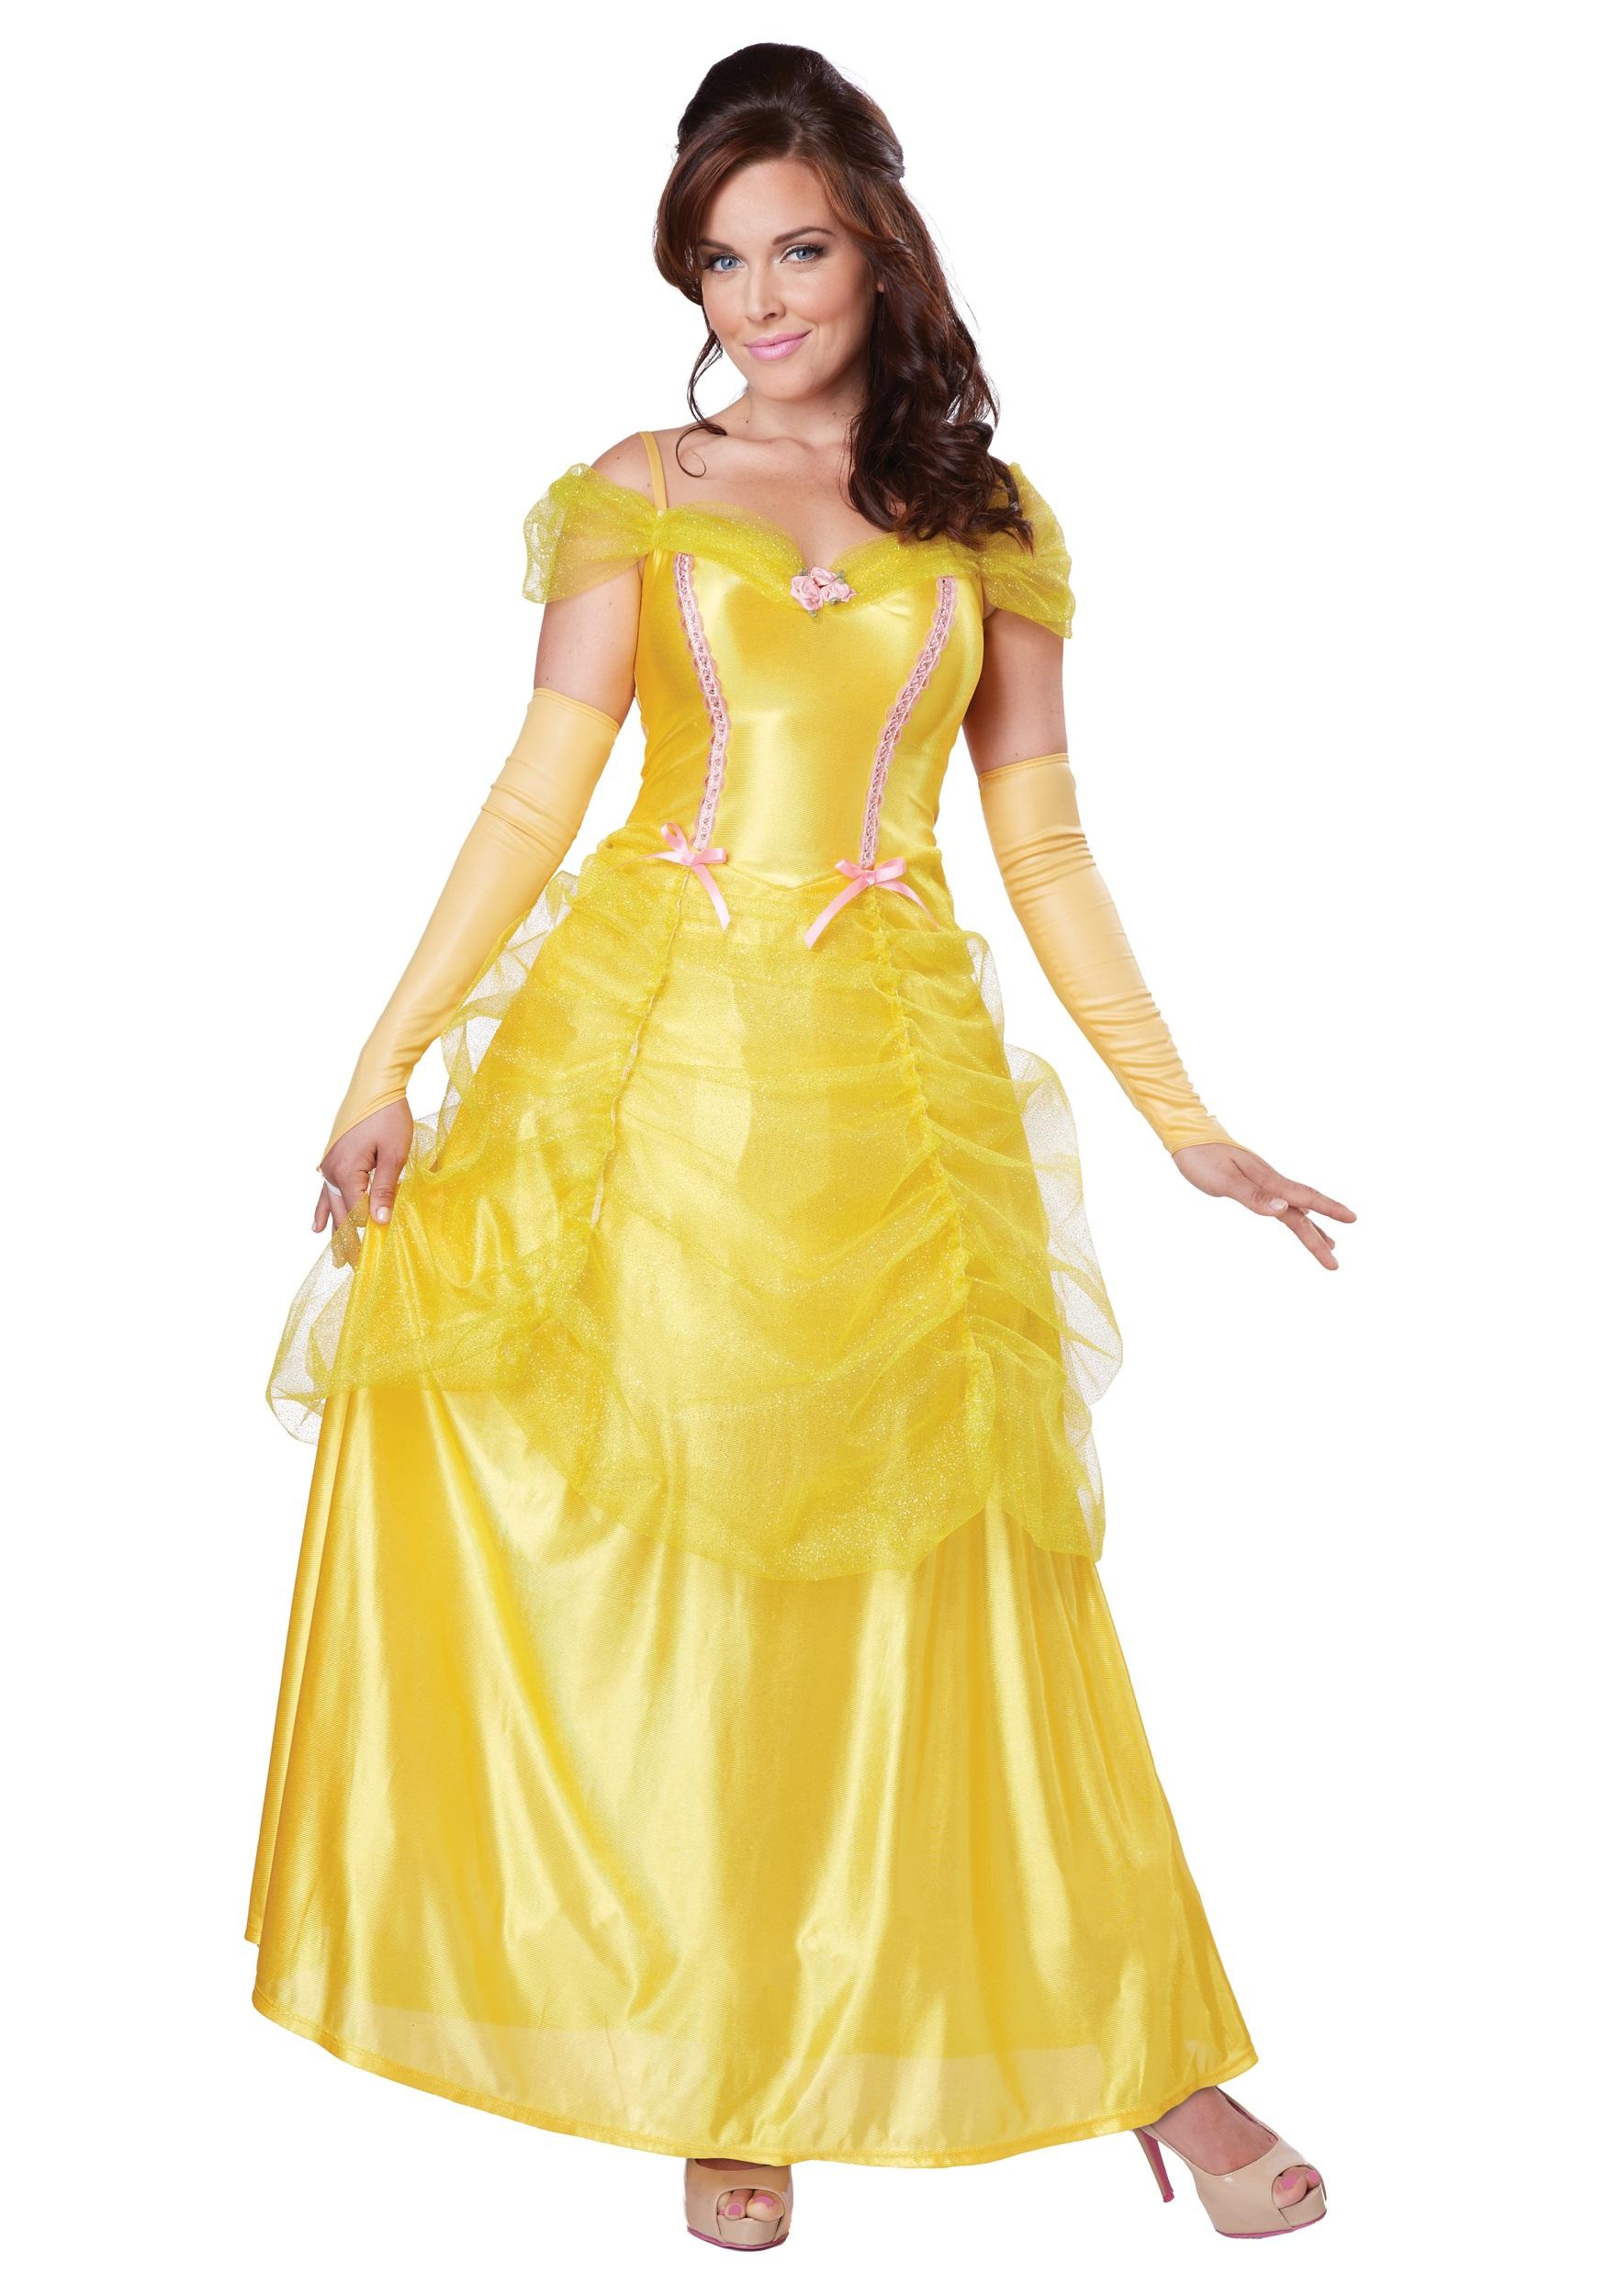 classic beauty - Classic Womens Halloween Costumes